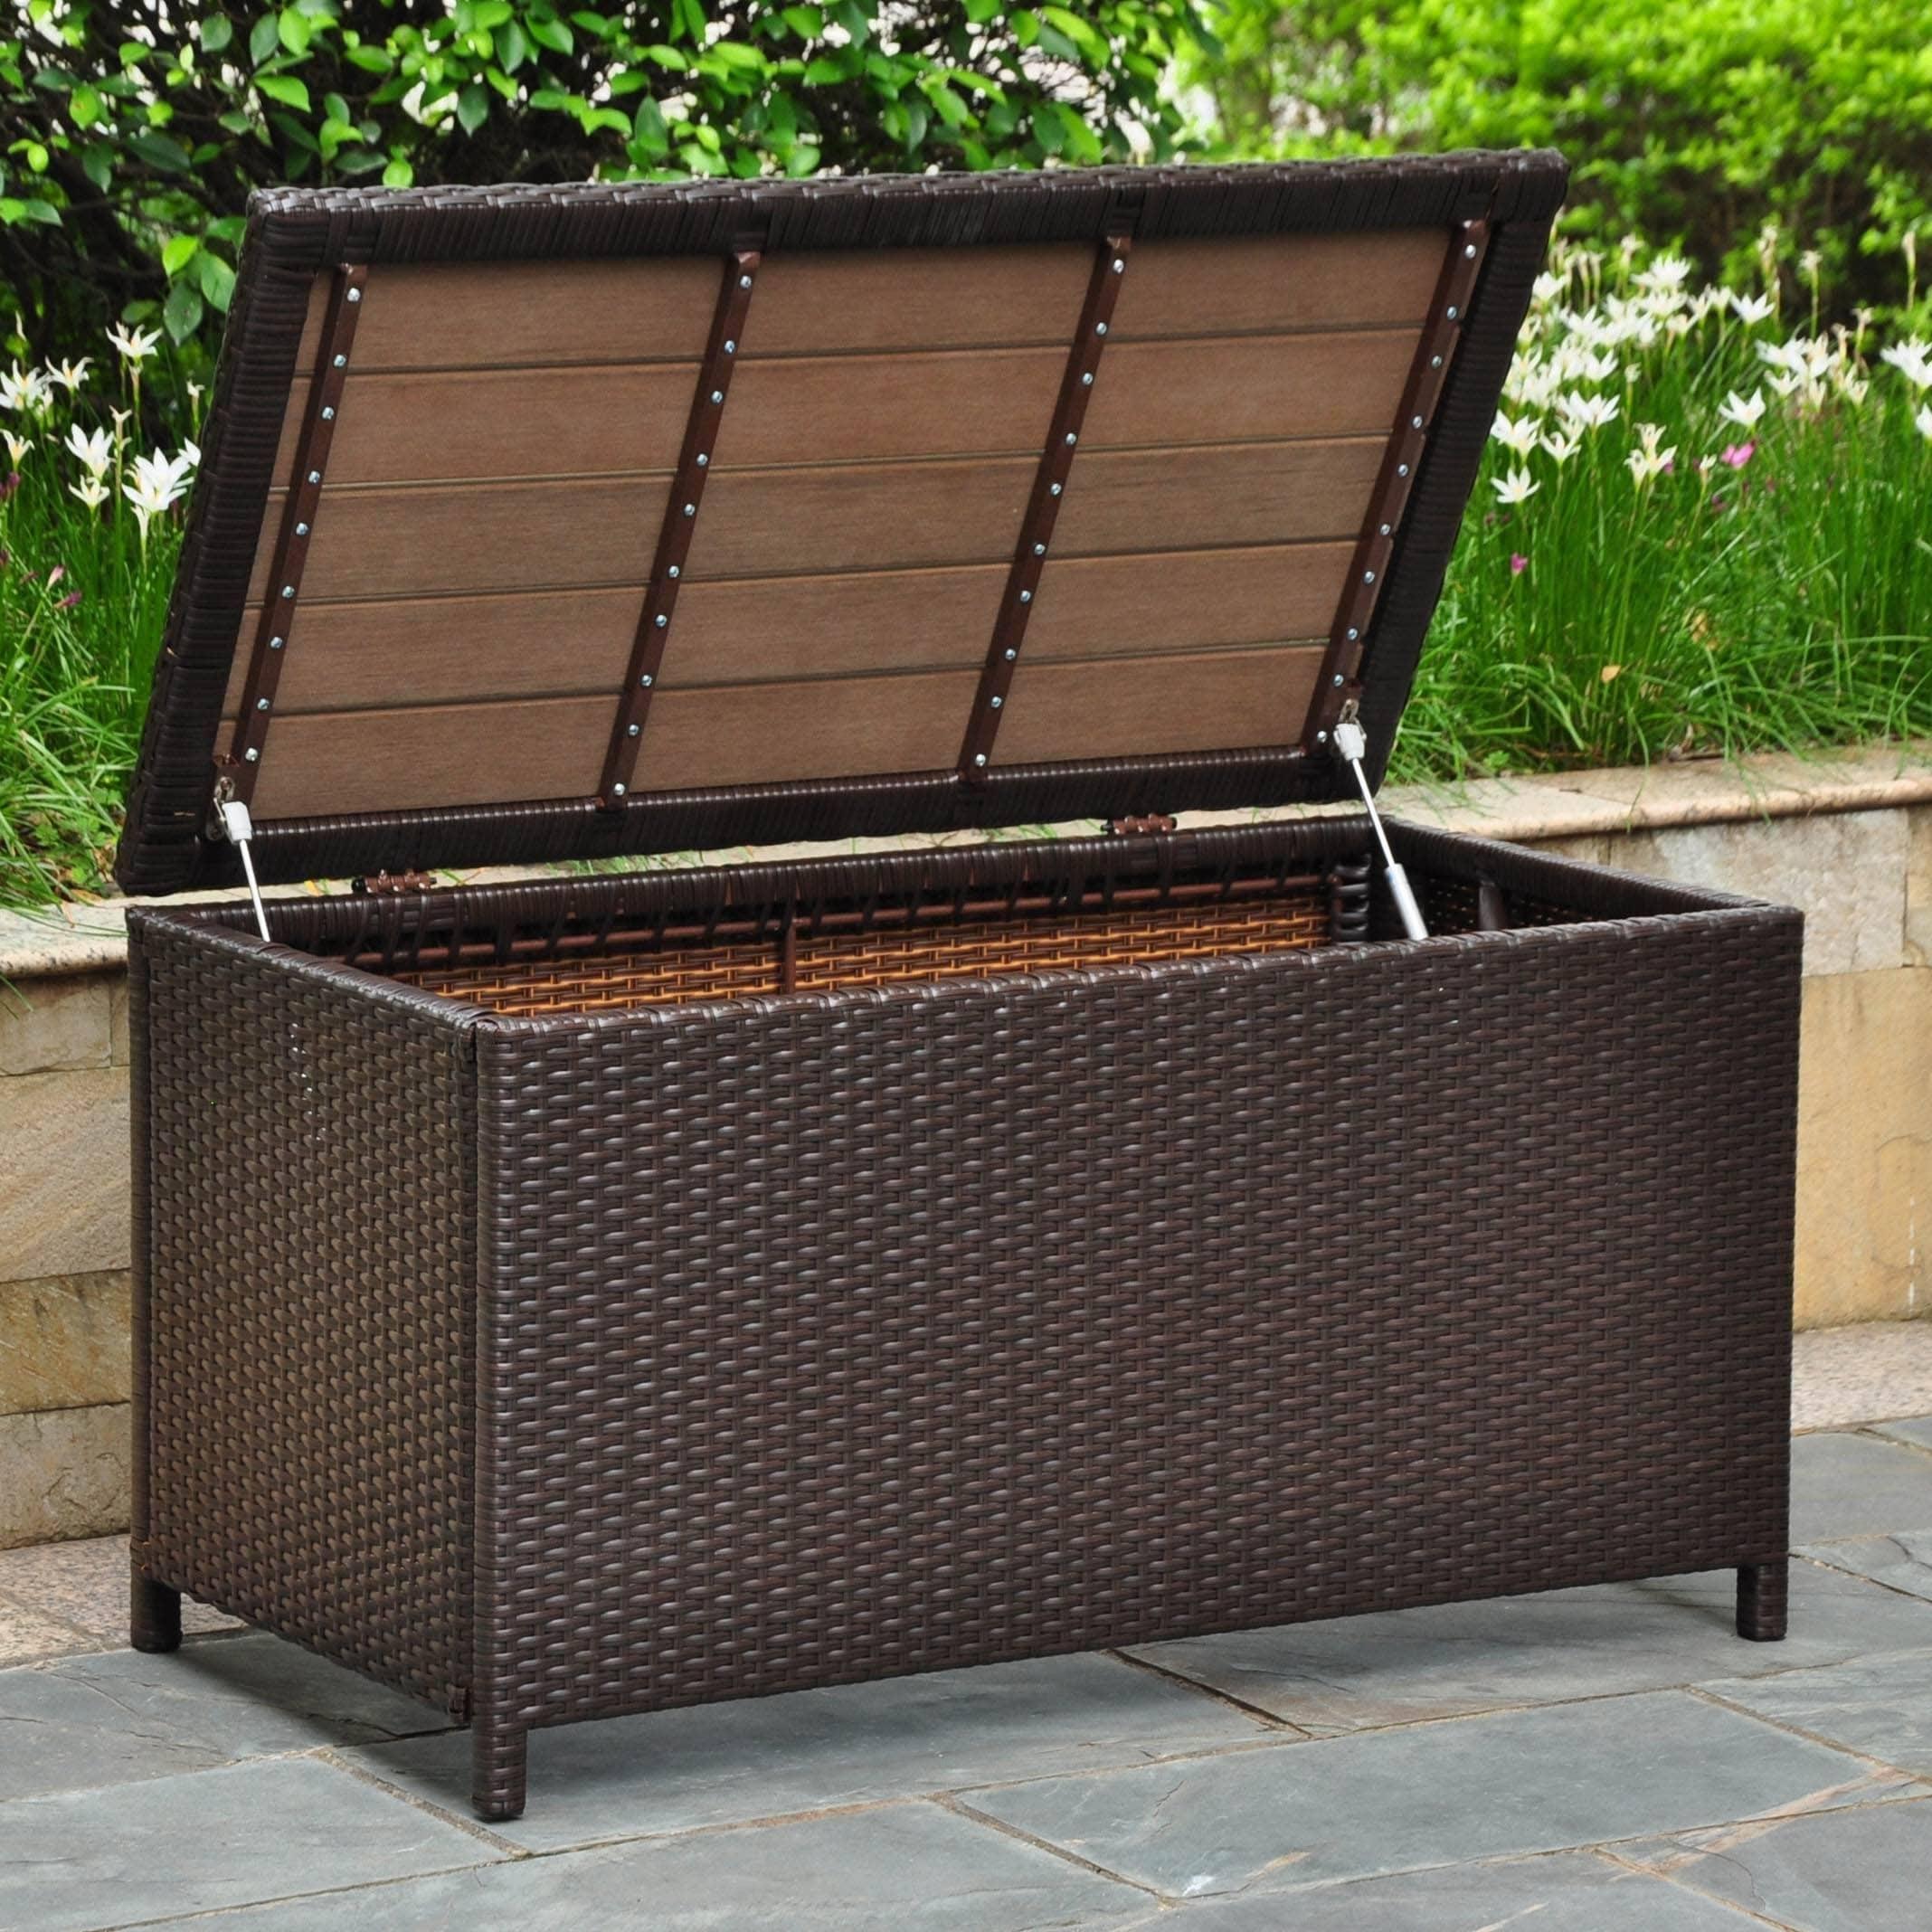 Terrific International Caravan Barcelona Resin Wicker Aluminum Outdoor Storage Trunk Dailytribune Chair Design For Home Dailytribuneorg